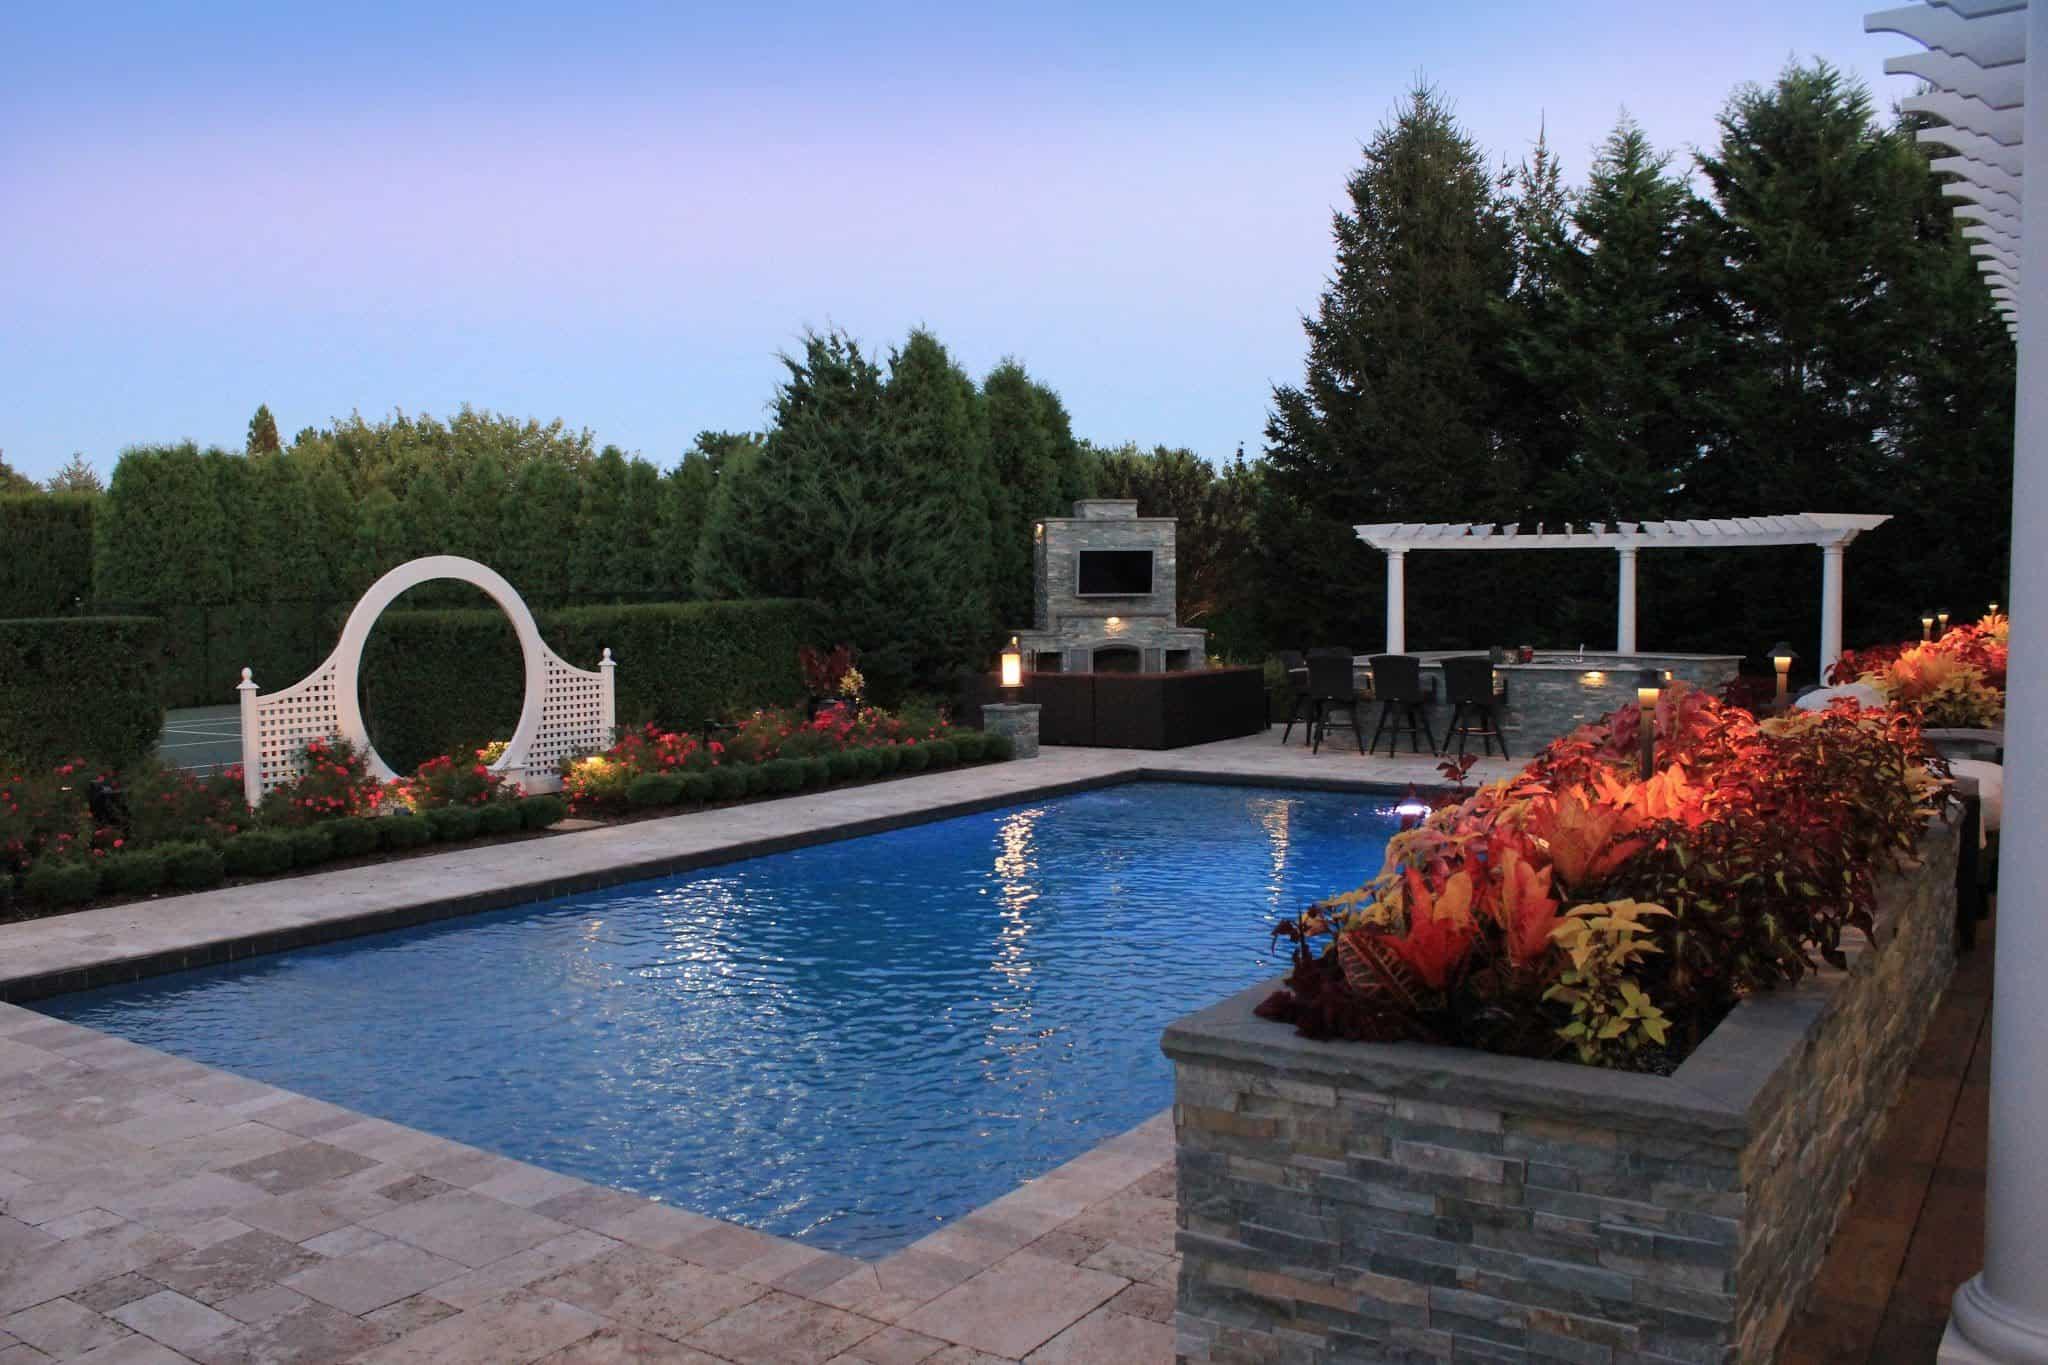 20' x 40' Gunite Pool with Black Slate Tile - Southampton, Long Island NY